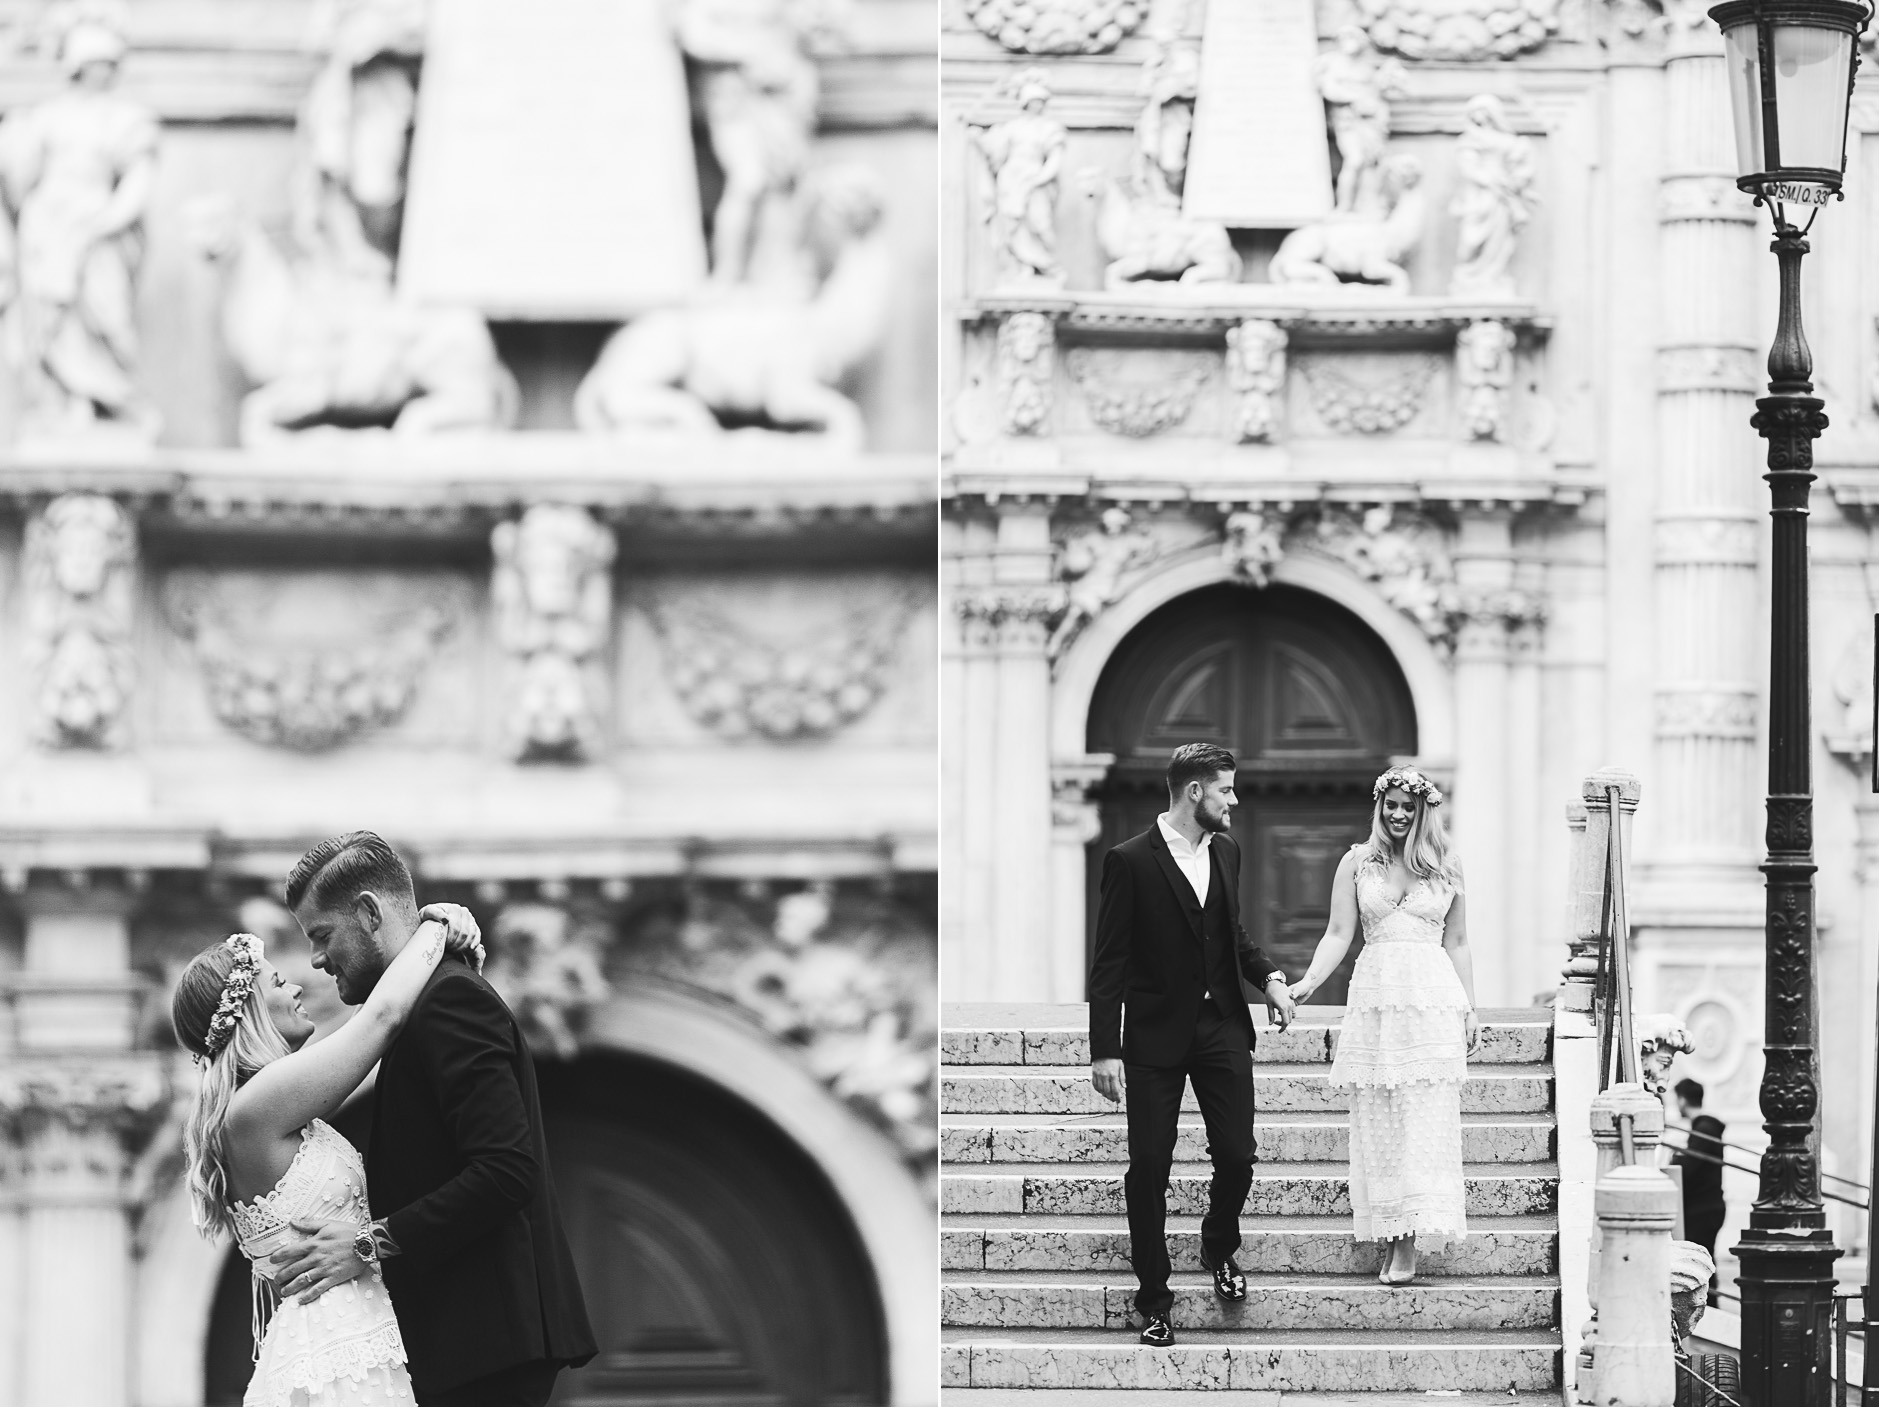 Hochzeitsfotograf Le Hai Linh Boho Chic After Wedding Shooting Venedig Timo Horn 1.FC Koeln 009.jpg